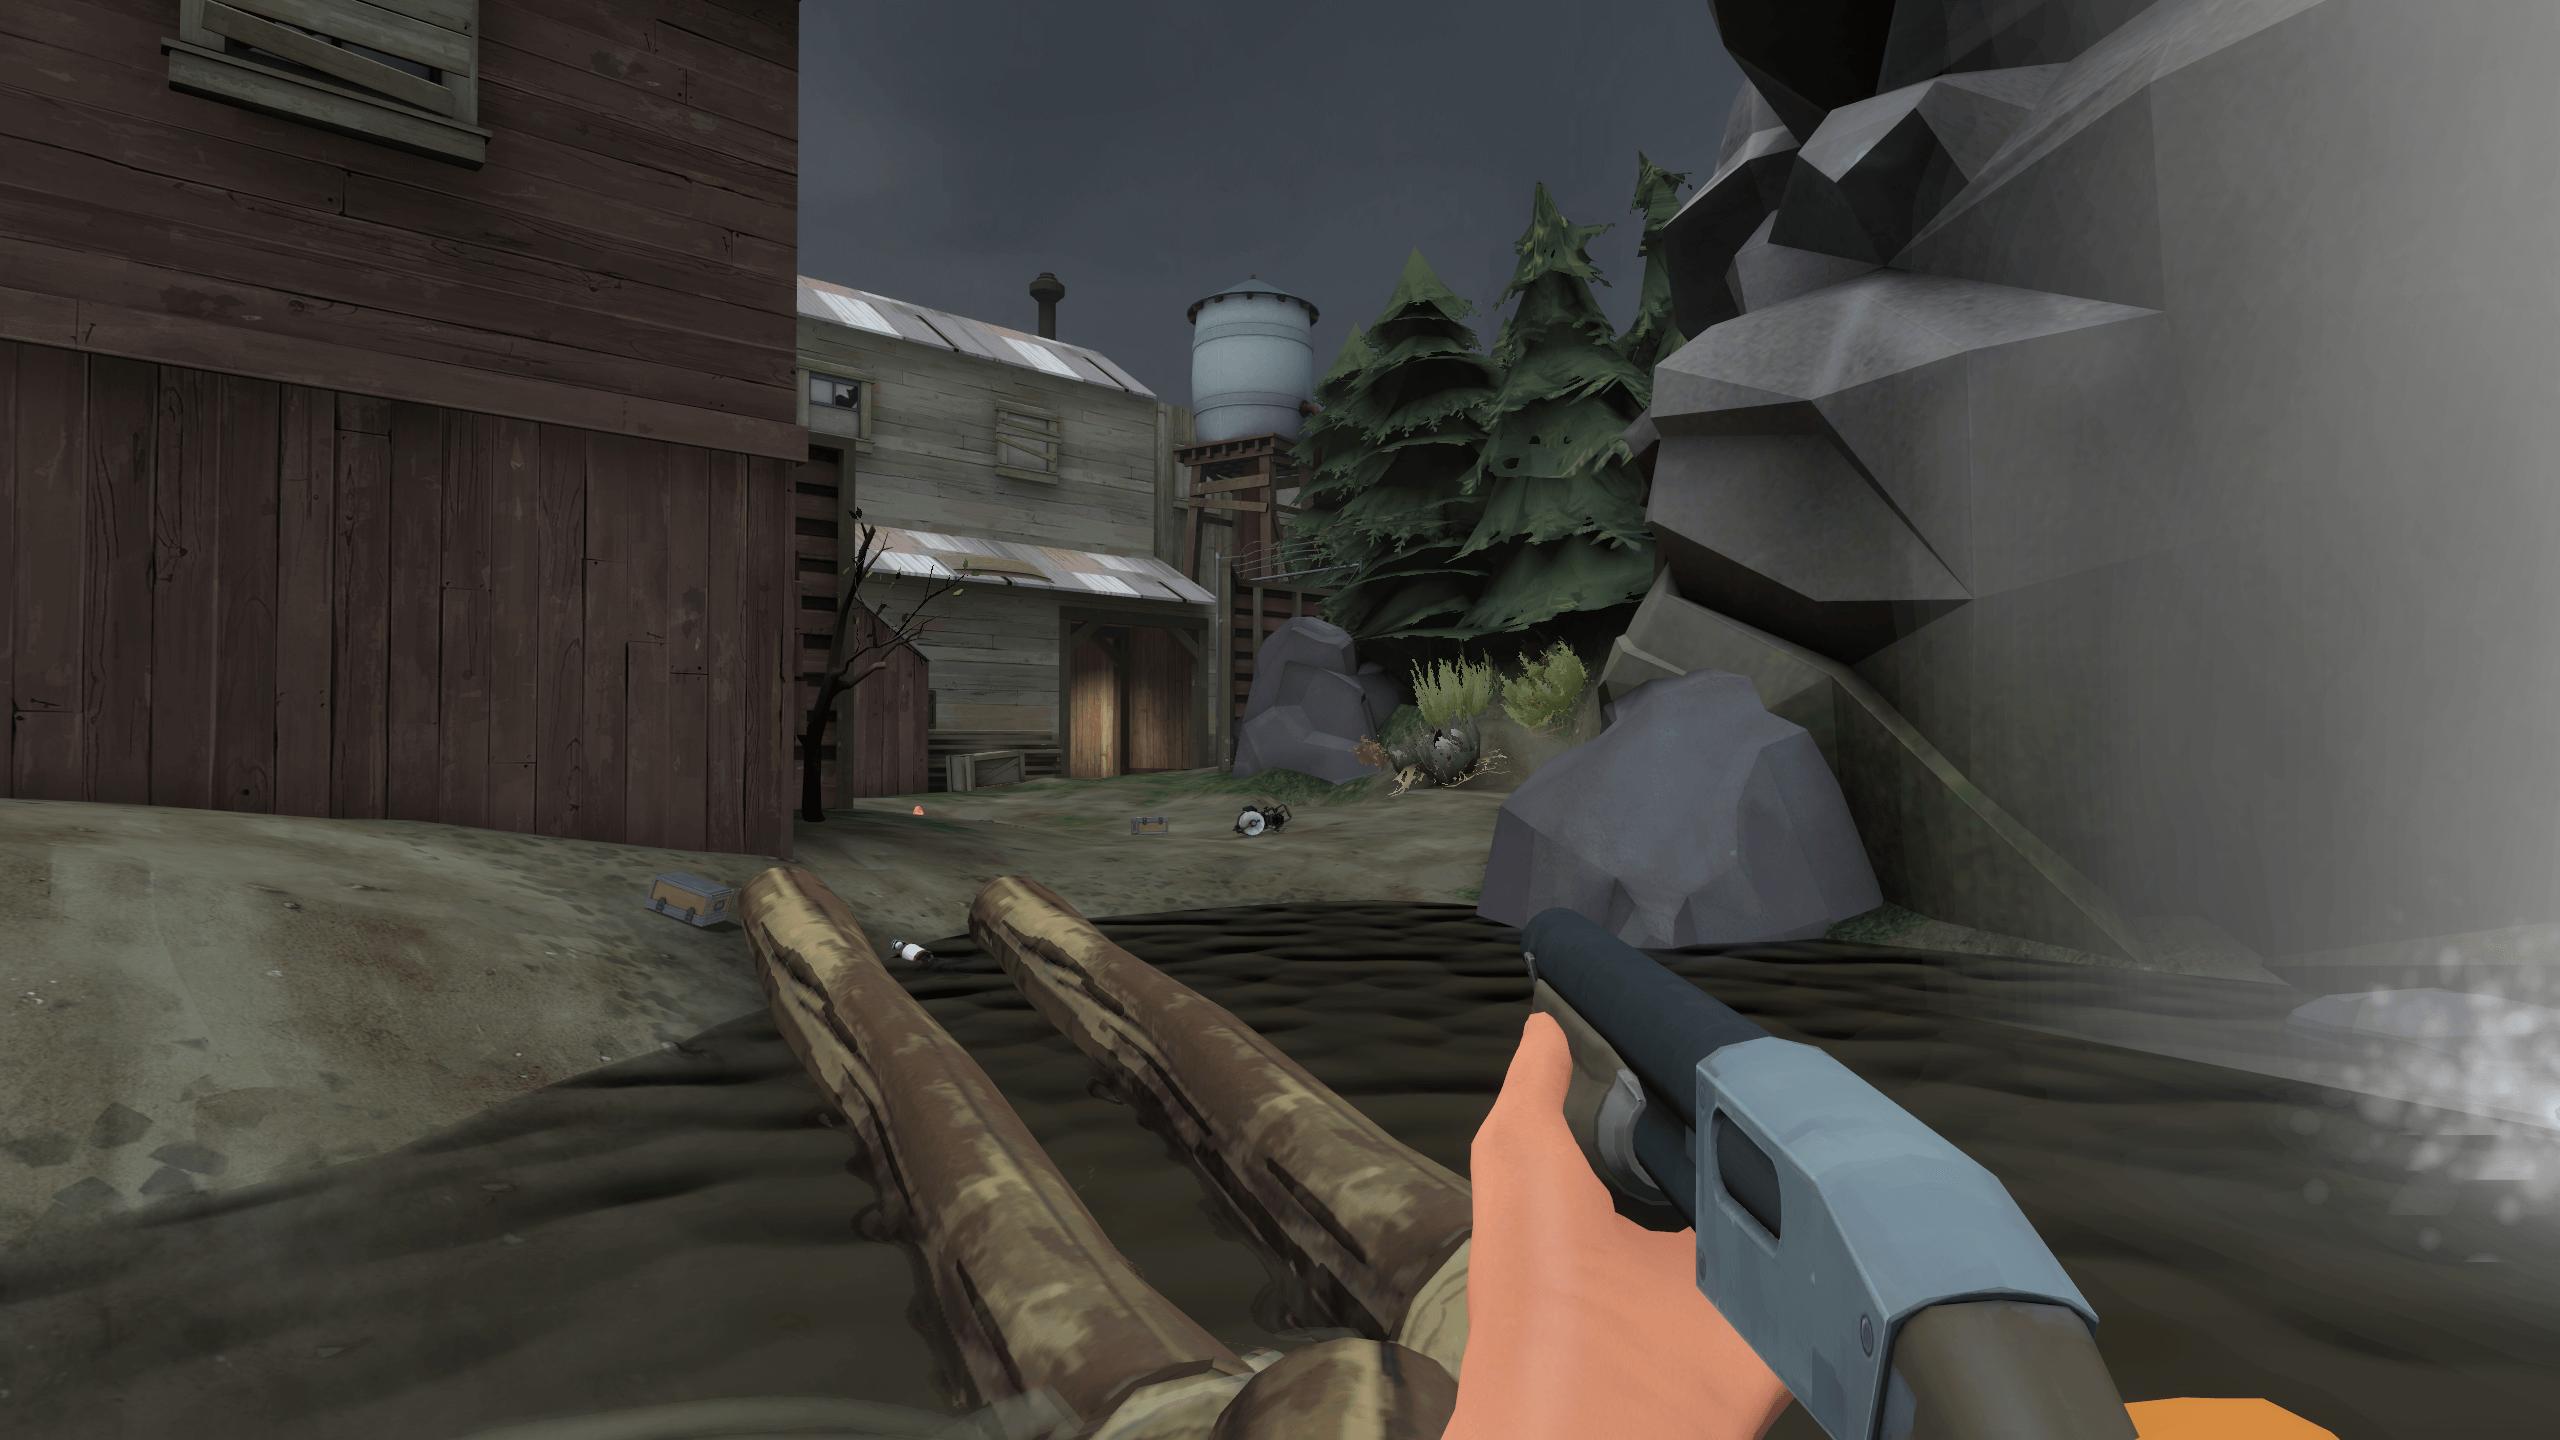 sawmill medium high